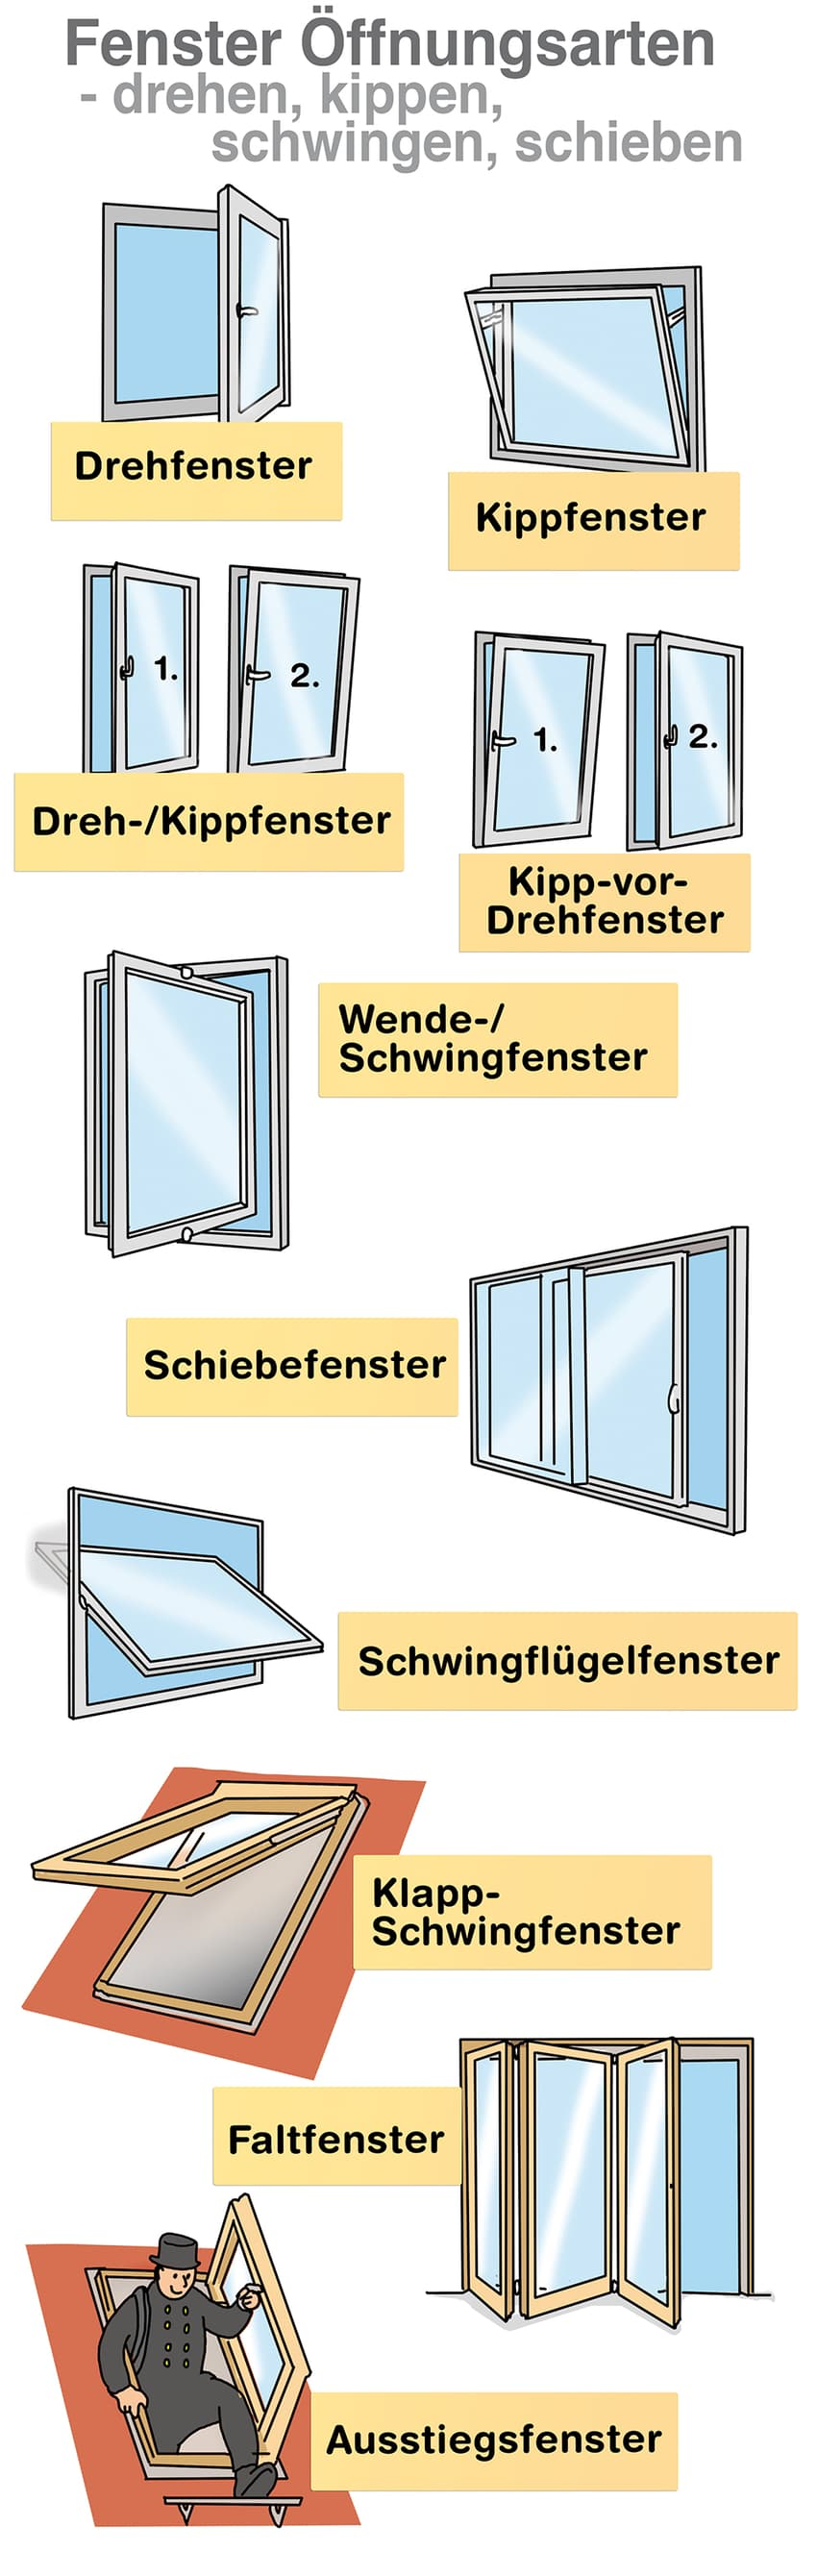 Fenster Öffnungsarten